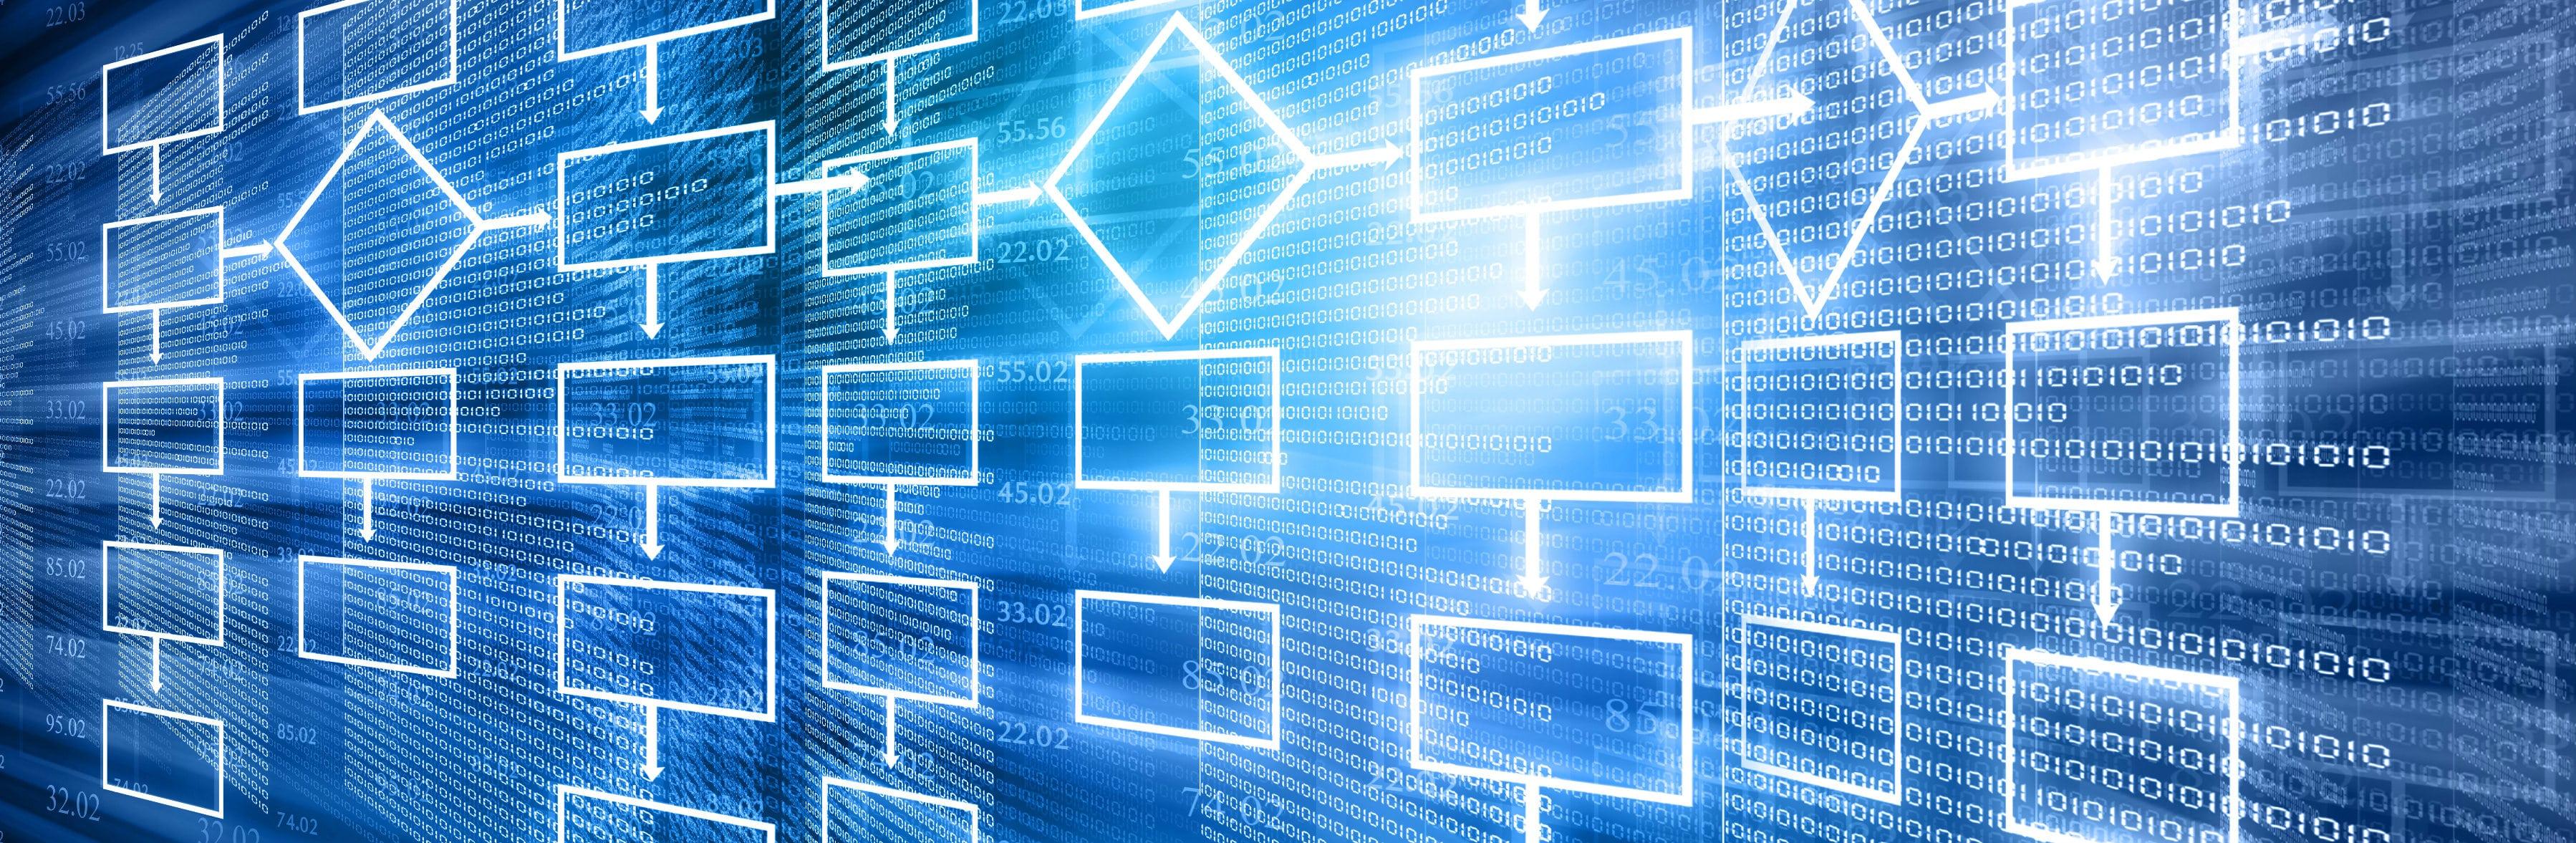 HR Workflow Software, HR Service Delivery, HR Process Design